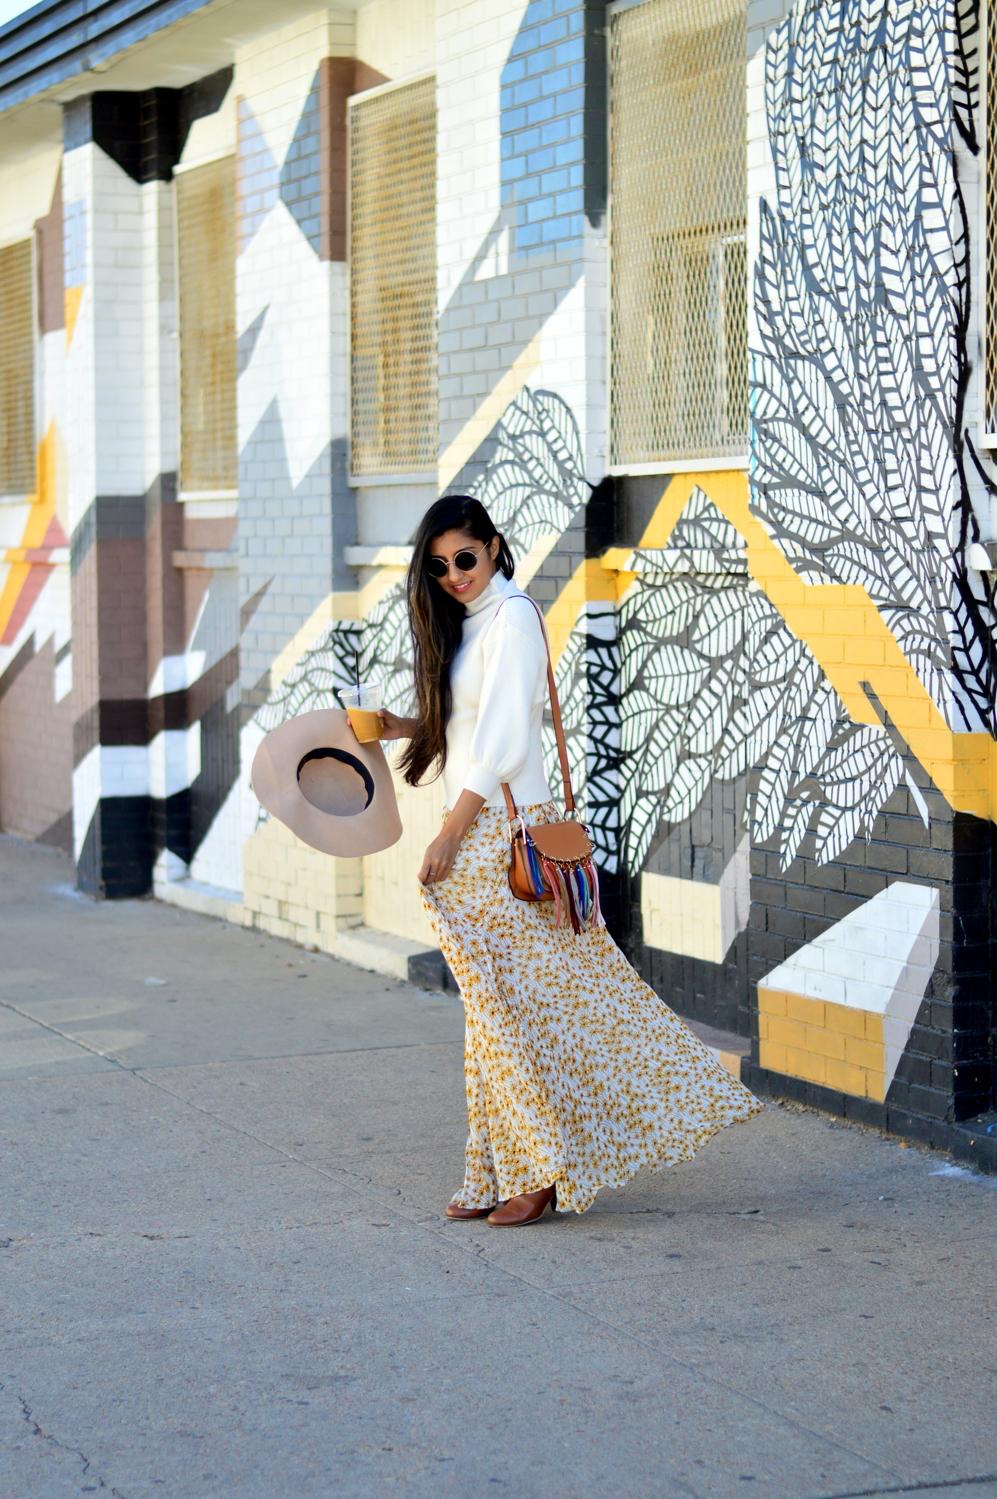 turtleneck-sweater-boho-floral-maxi-dress-travel-Denver-style 2